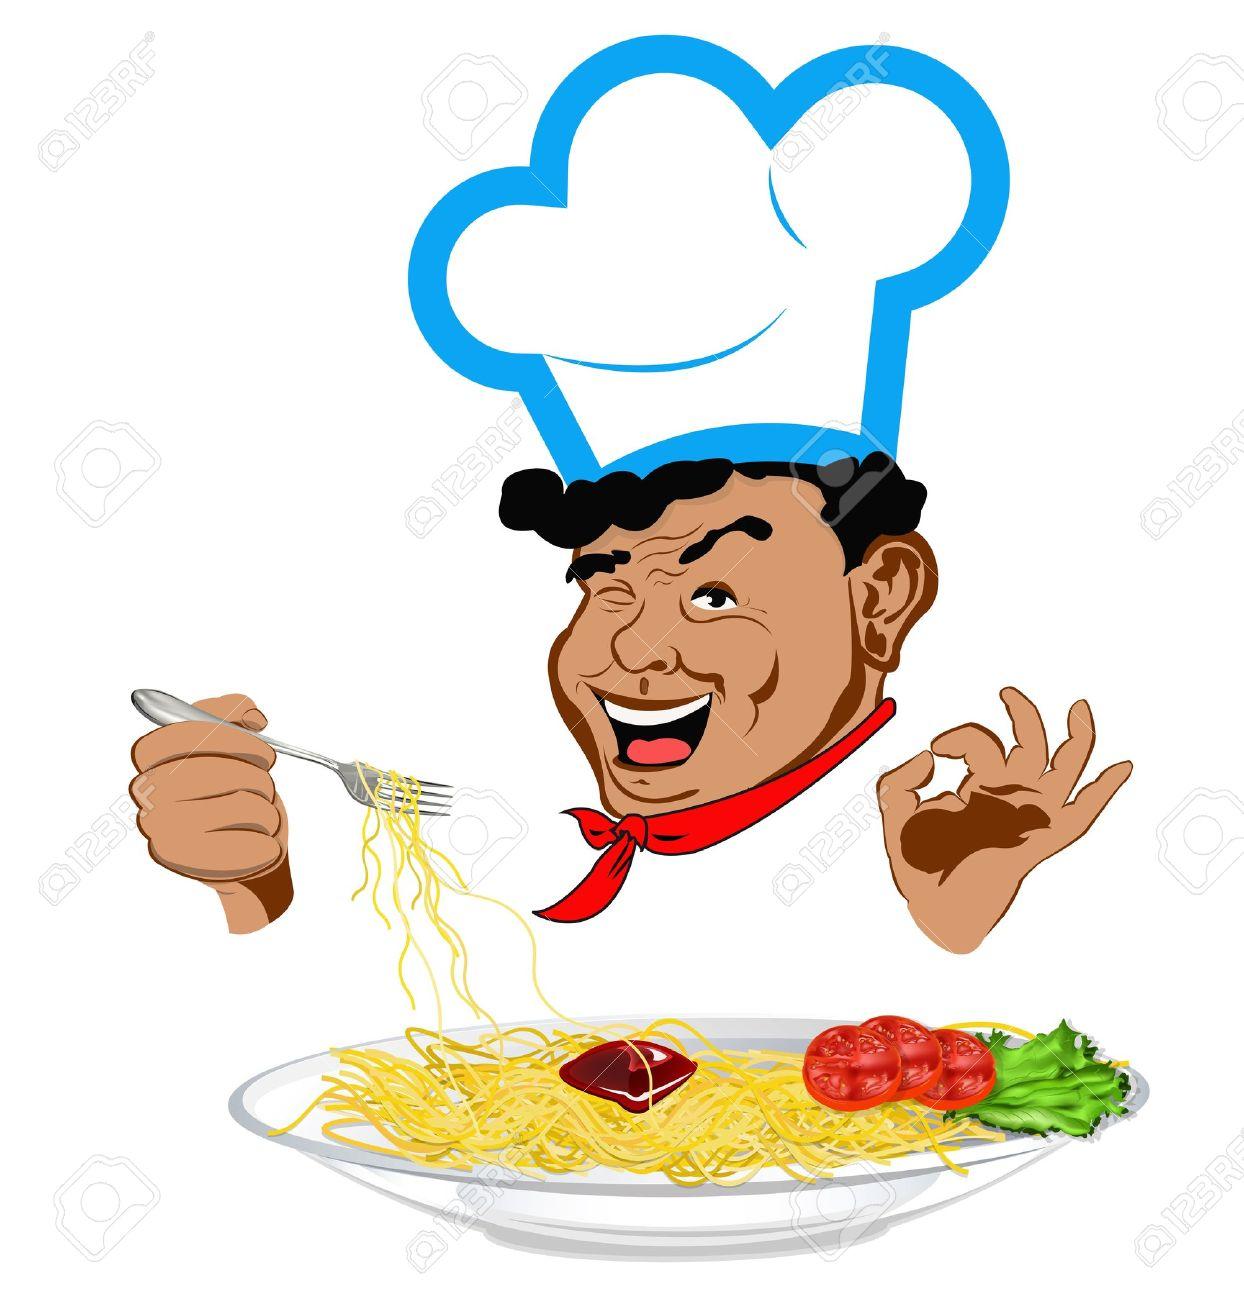 1244x1300 Chef Cooking Pasta Spaghetti Clipart, Explore Pictures